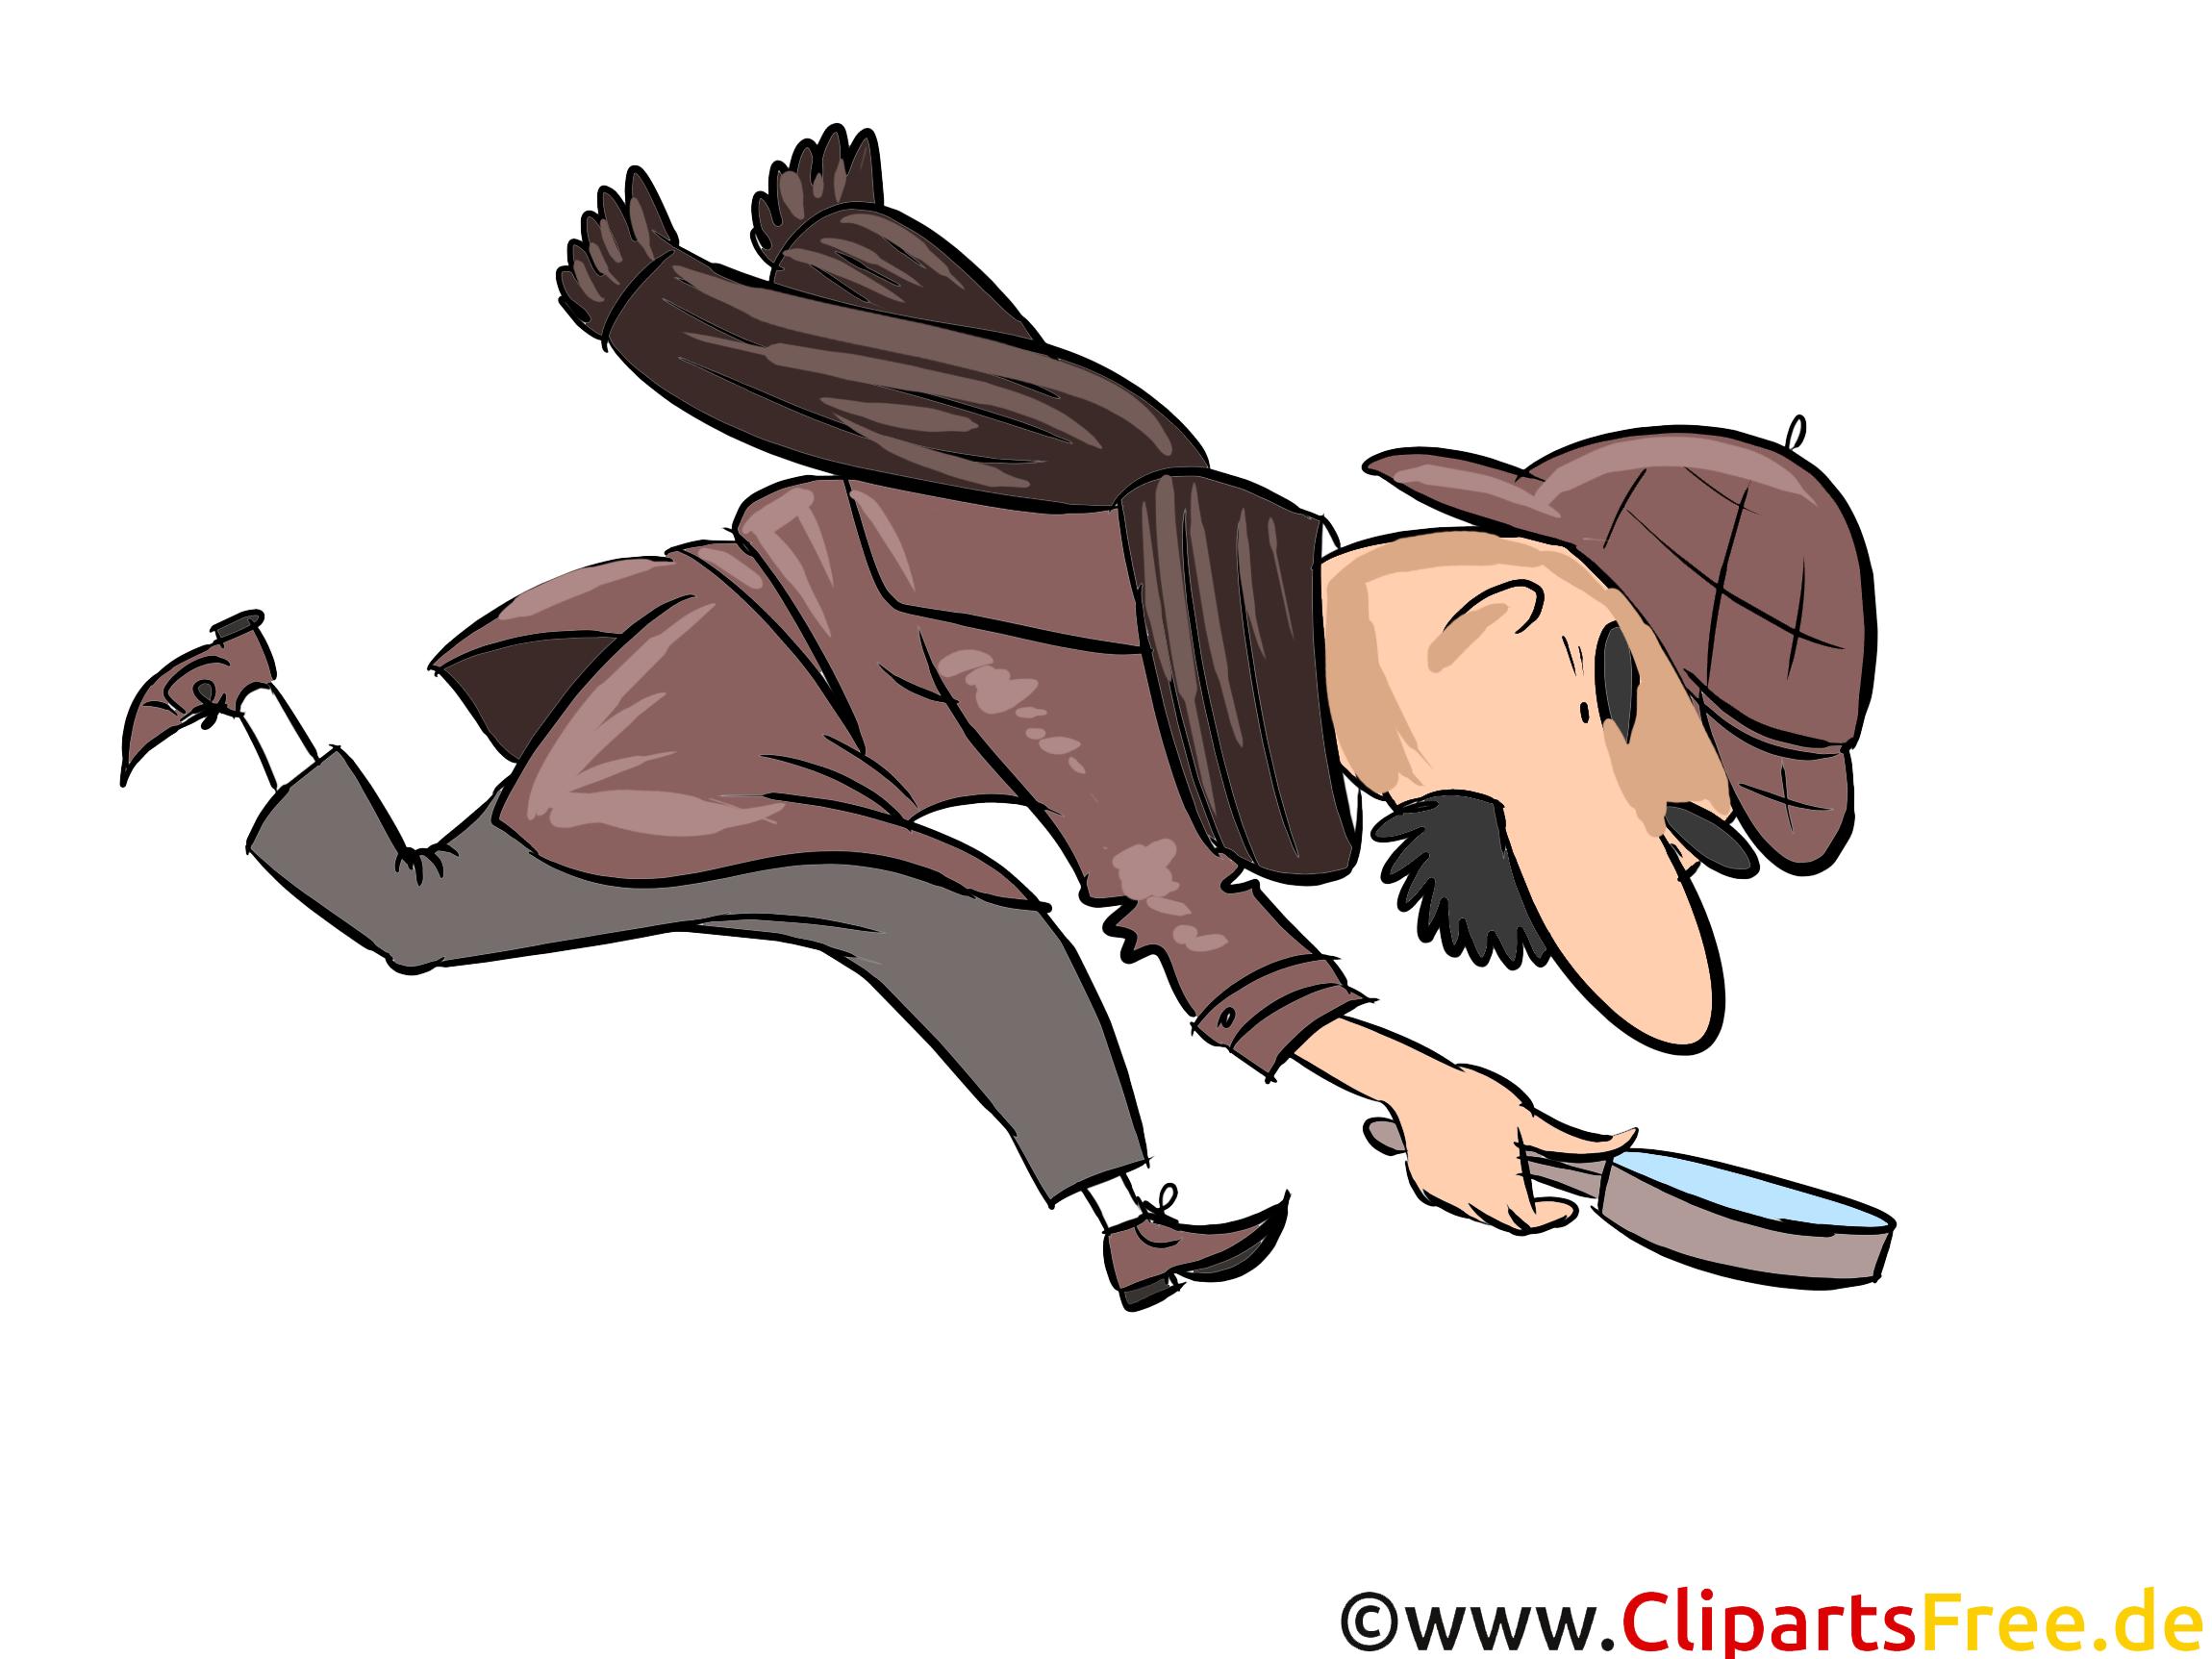 Kriminalpolizei auf Spursuche Illustration, Bild, Comic, Cartoon